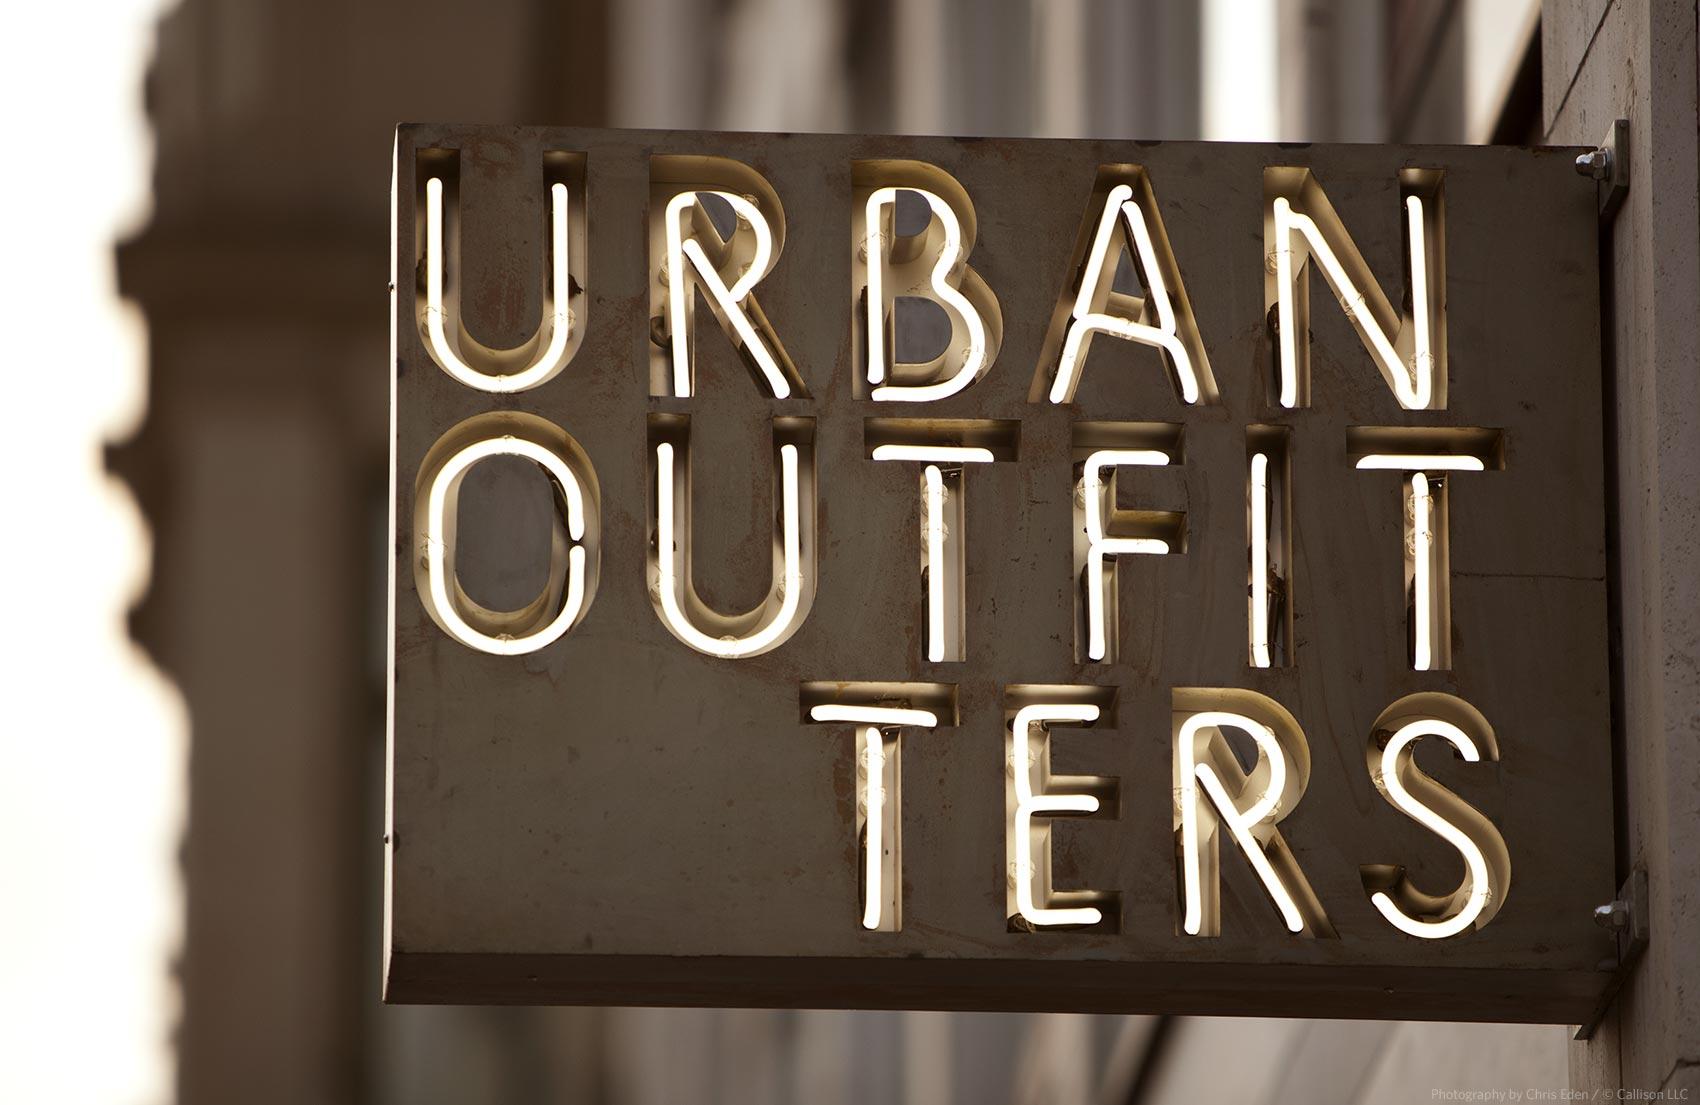 Urban Outfitters, Berlin -Kurfϋrstendamm - Signage detail -